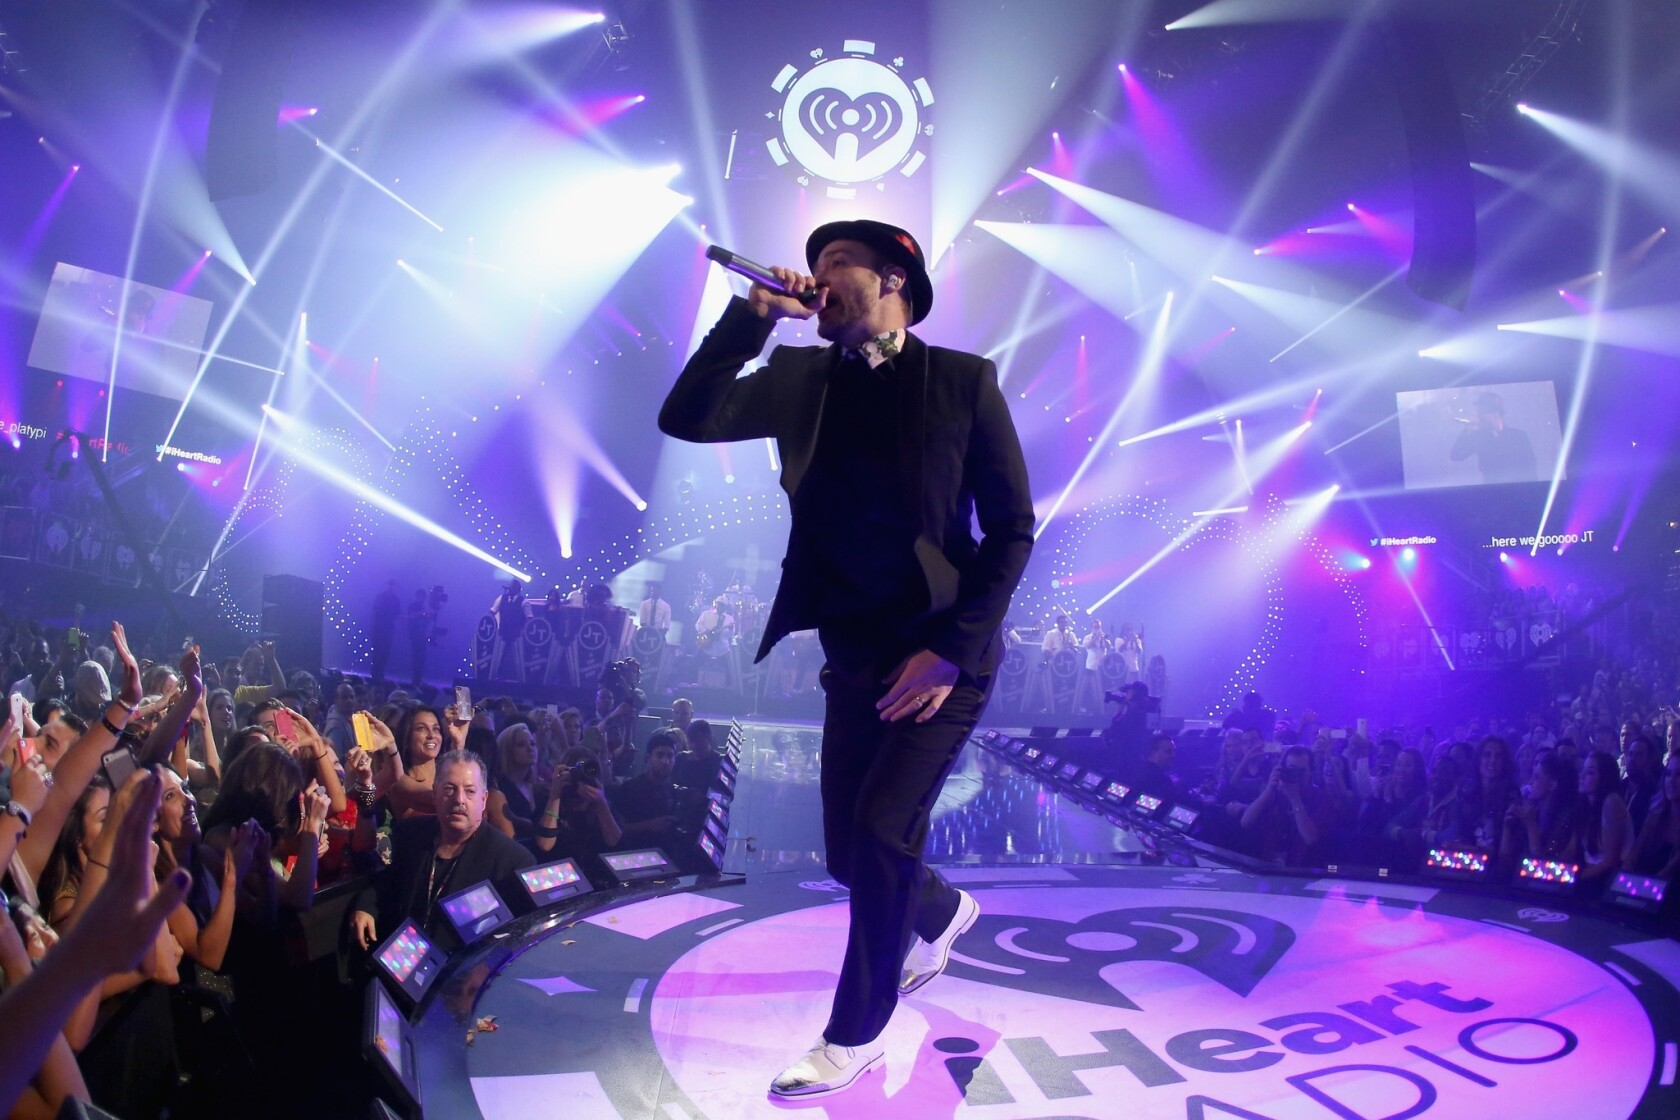 IHeartRadio 2013: Justin Timberlake, Miley Cyrus close the